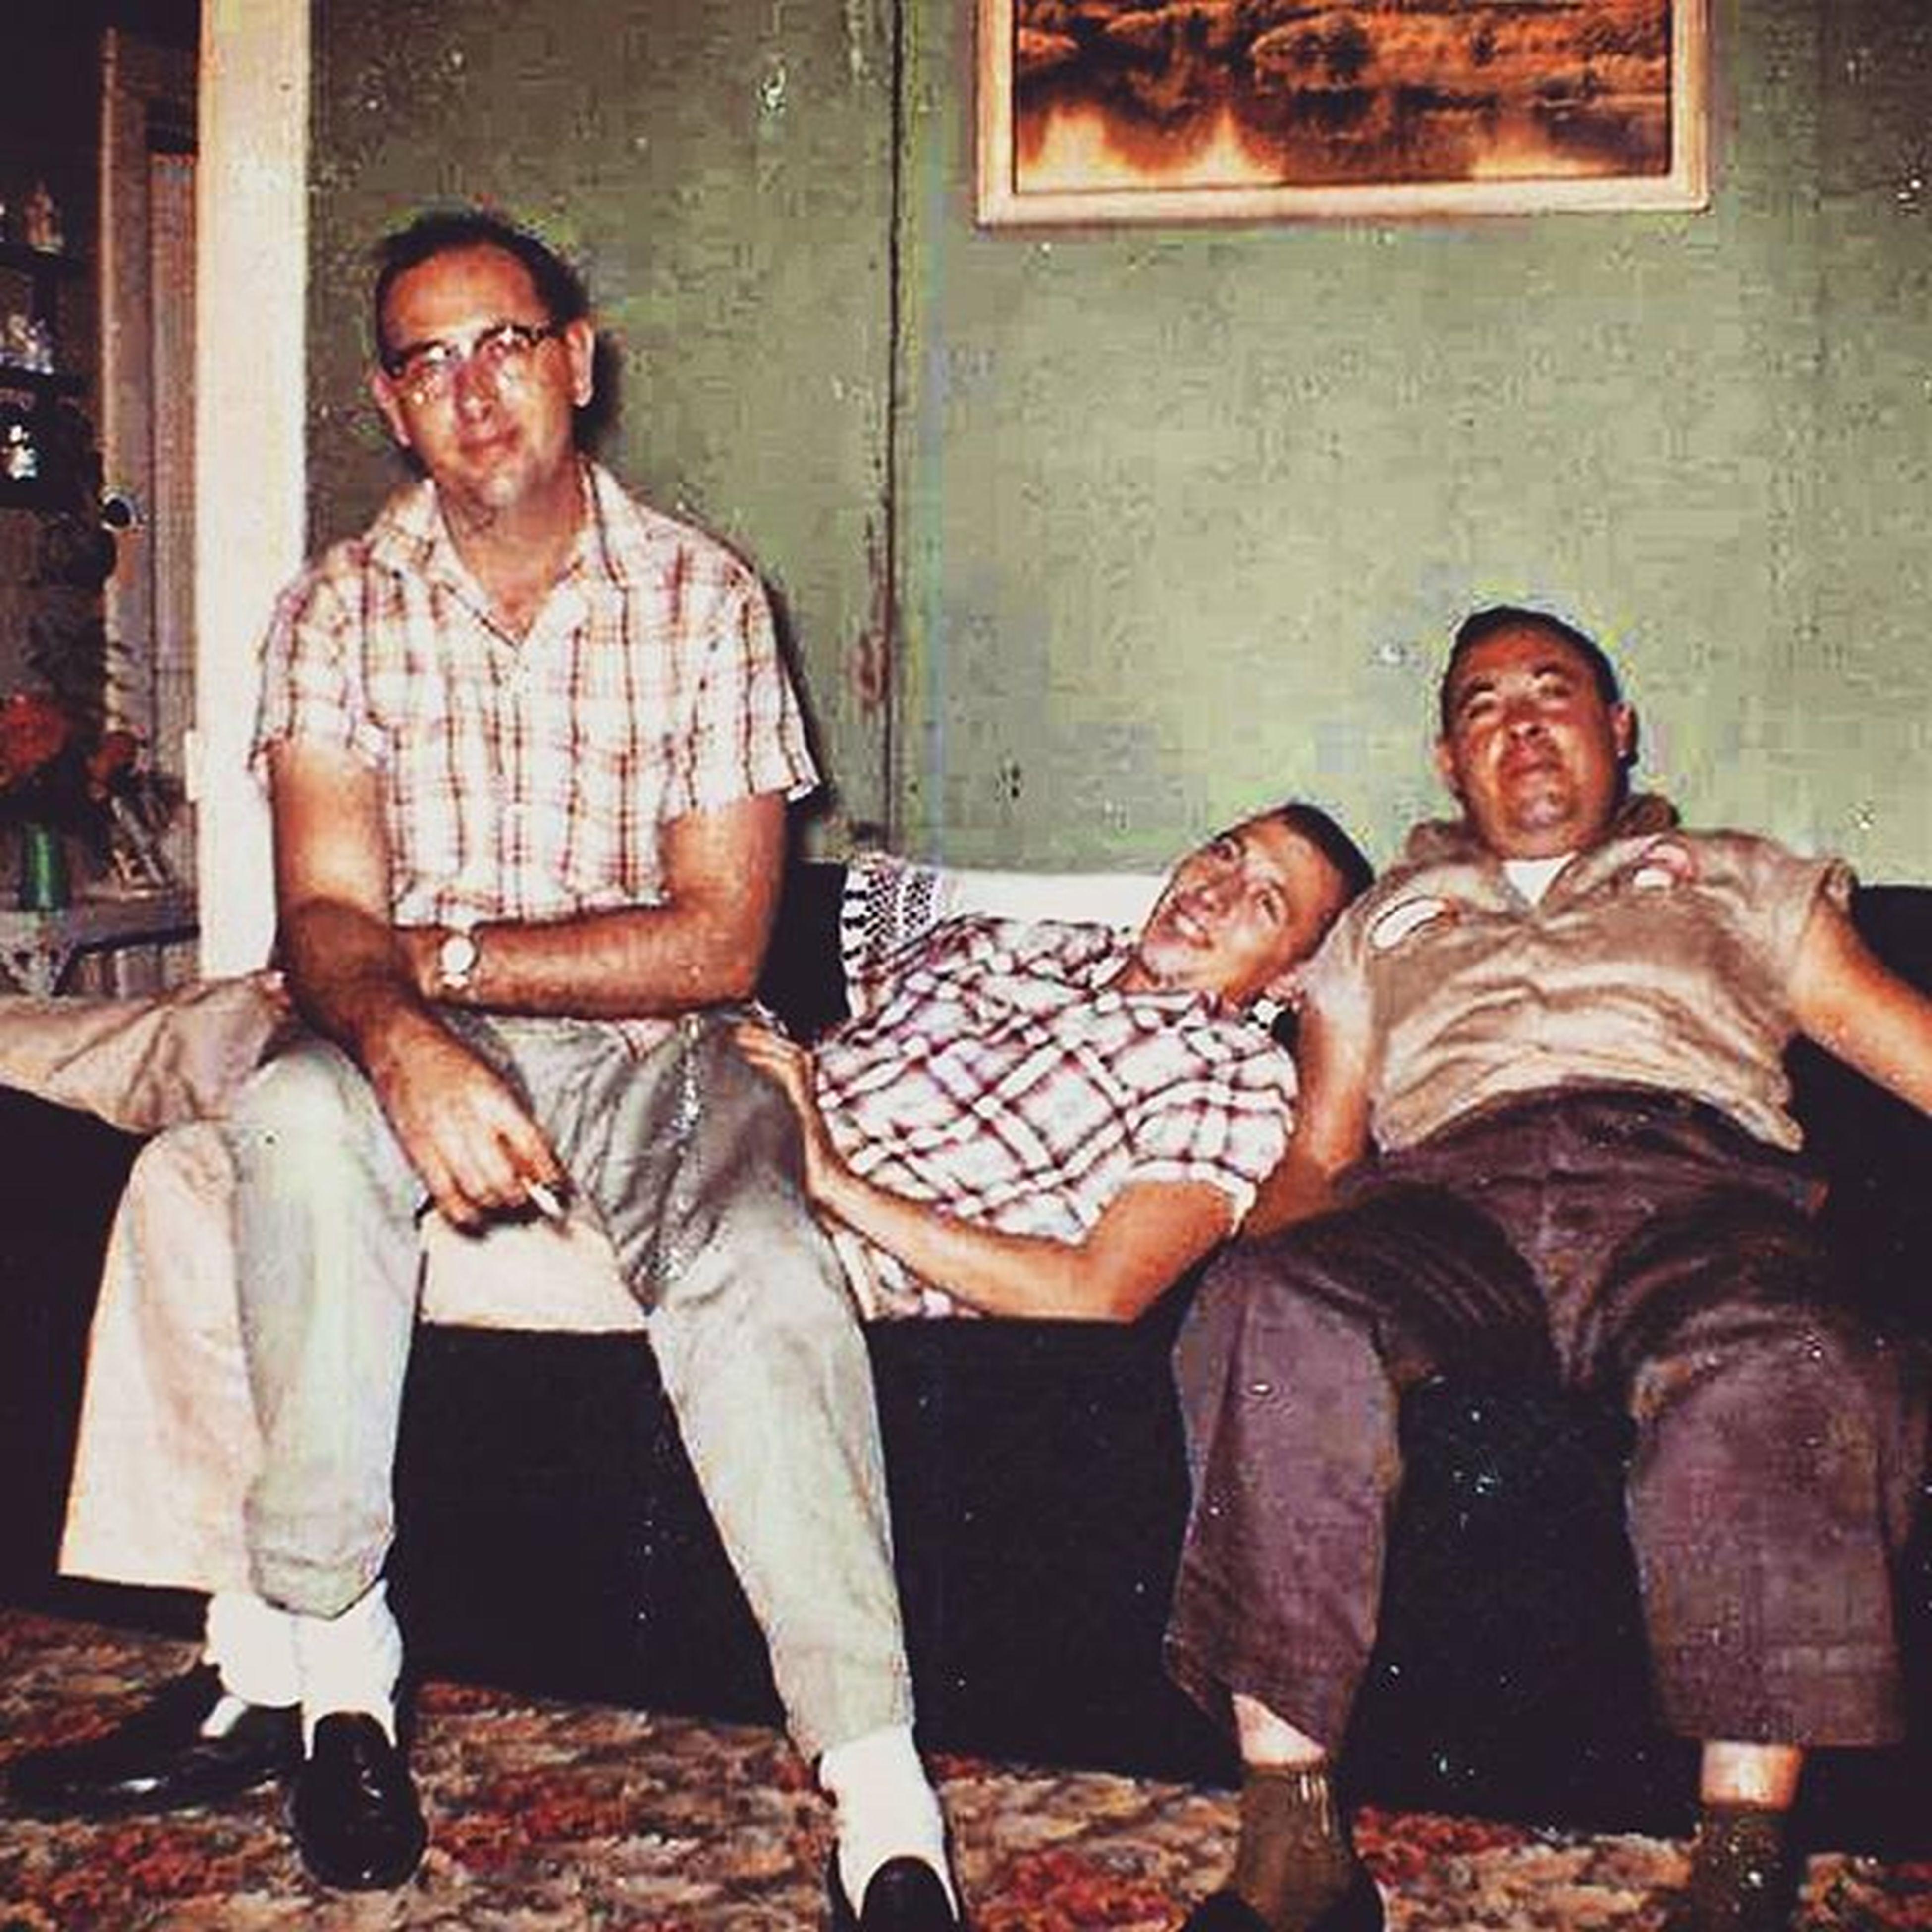 L to R: My Dad Ralph with my uncles Jon & Lee Miller circa 1961. Youhavetoknowwhereyourefromtoknowwhereyouregoing